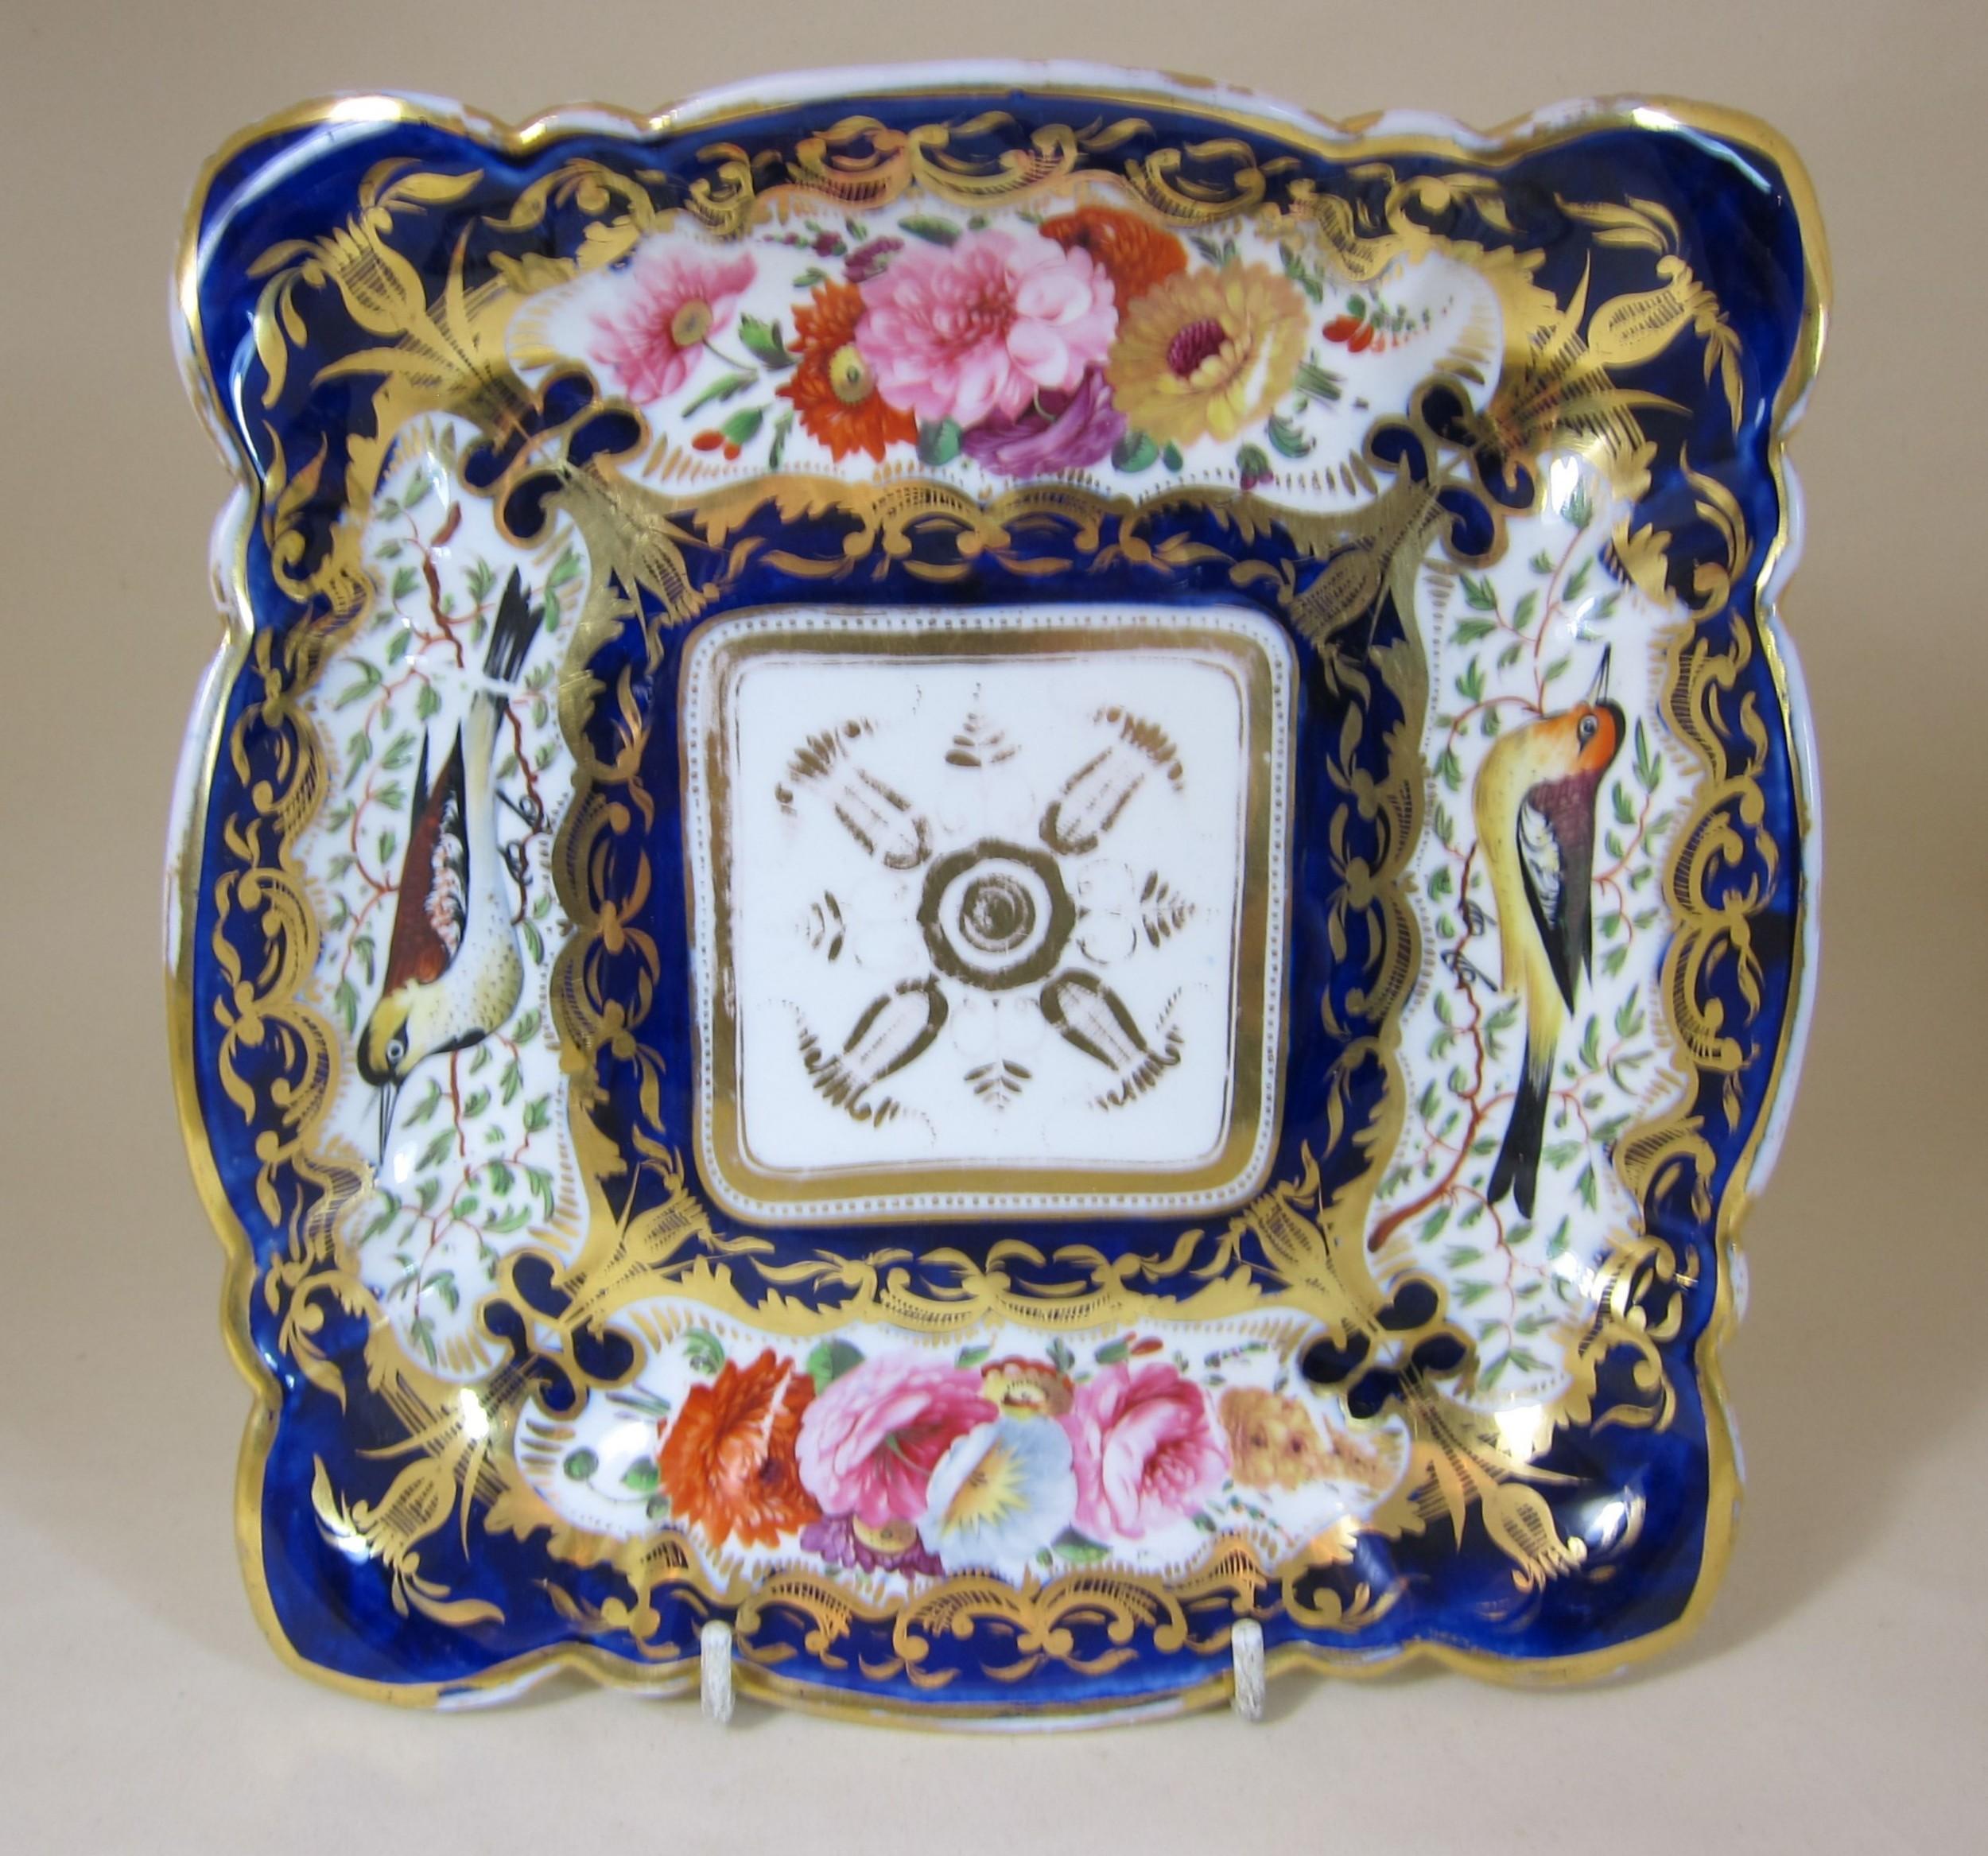 coalport porcelain 850 square dish decorated with birds flowers